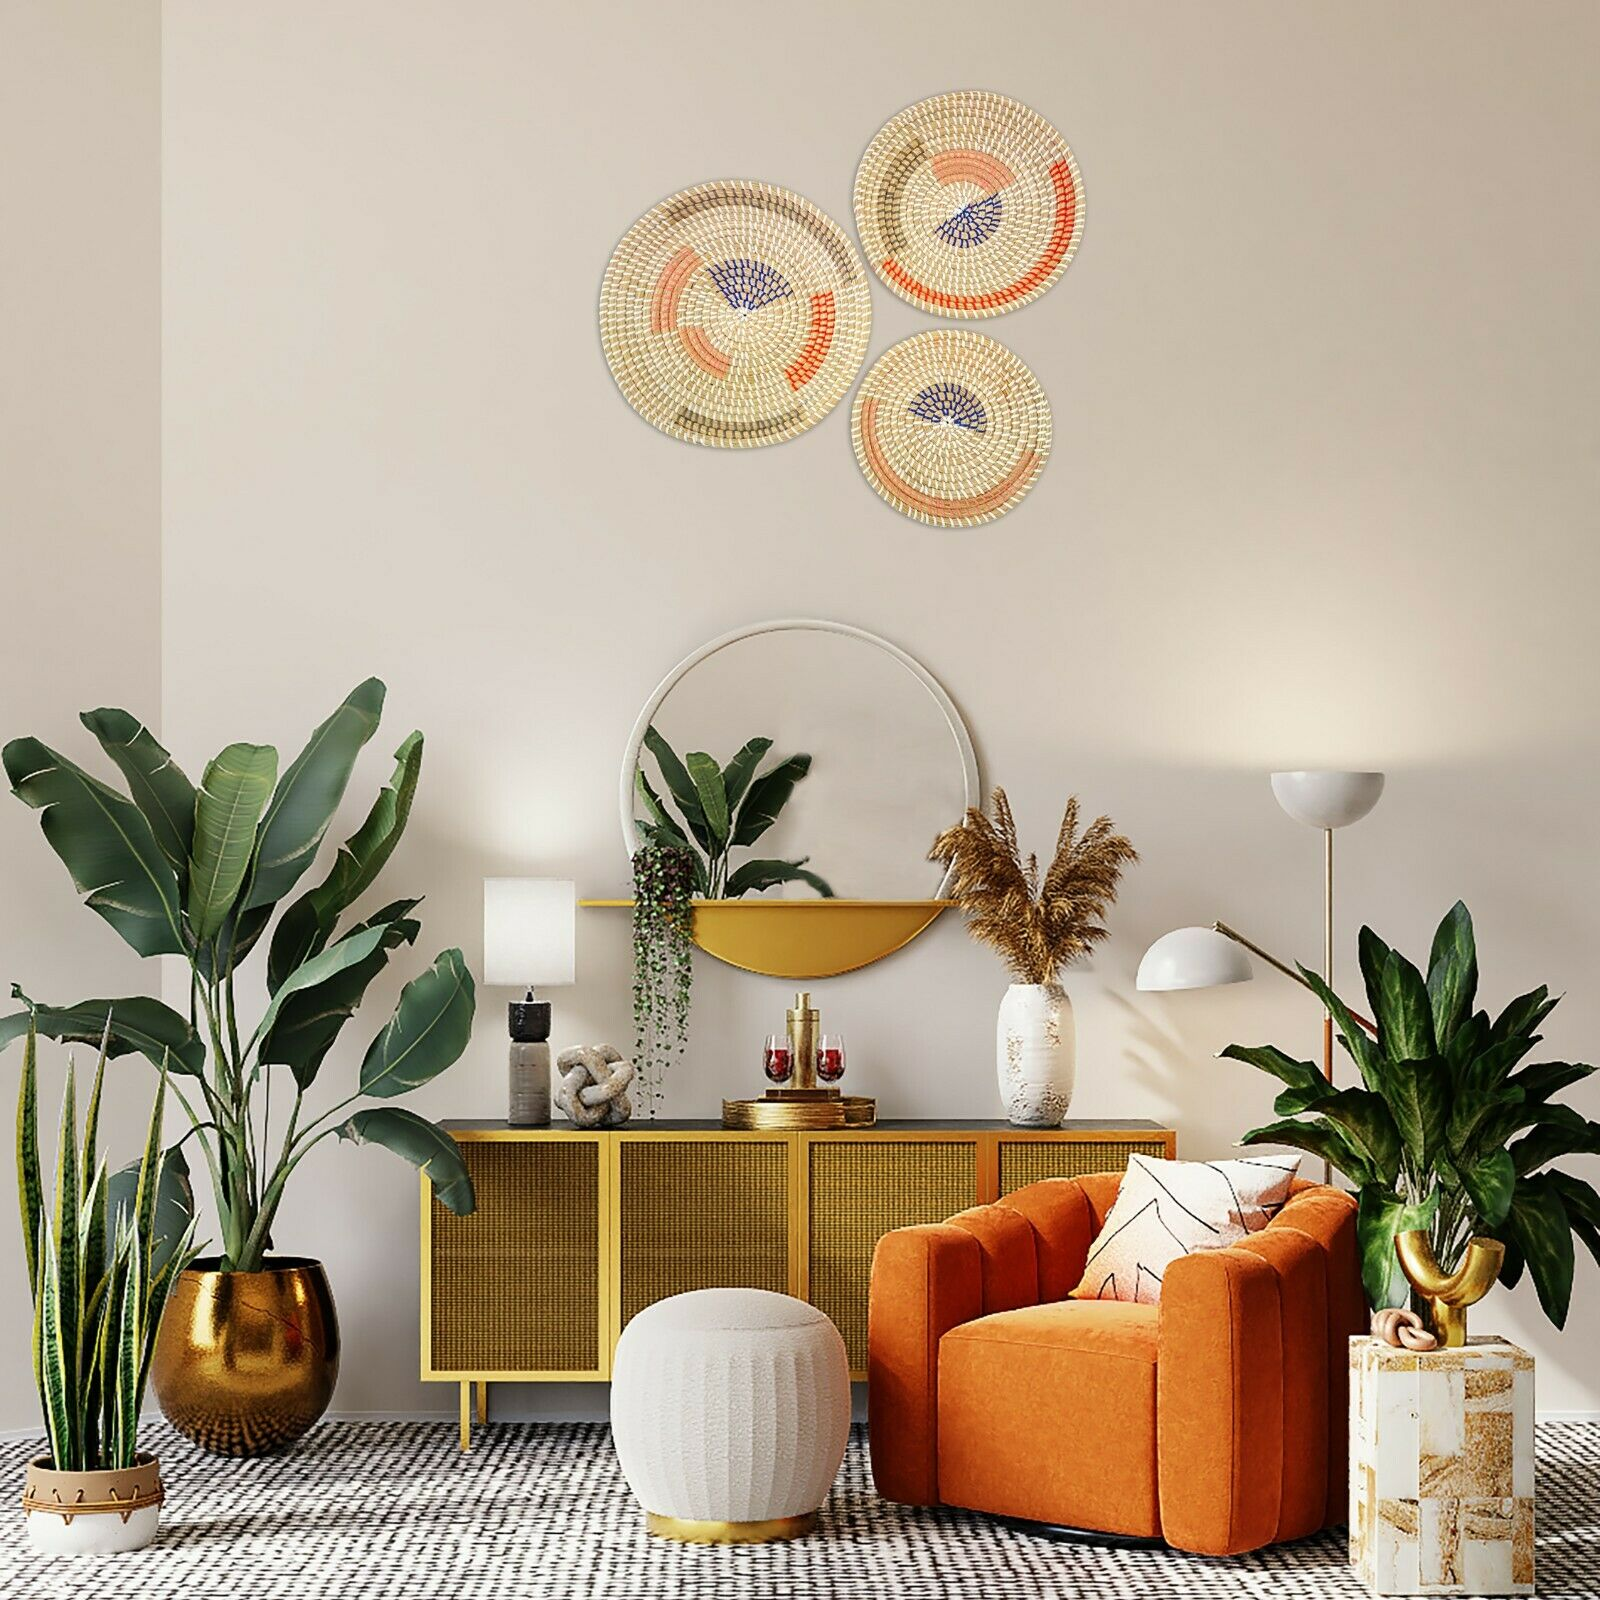 Set of 3 boho Wall Basket Decor, Woven seagrass basket, Wall